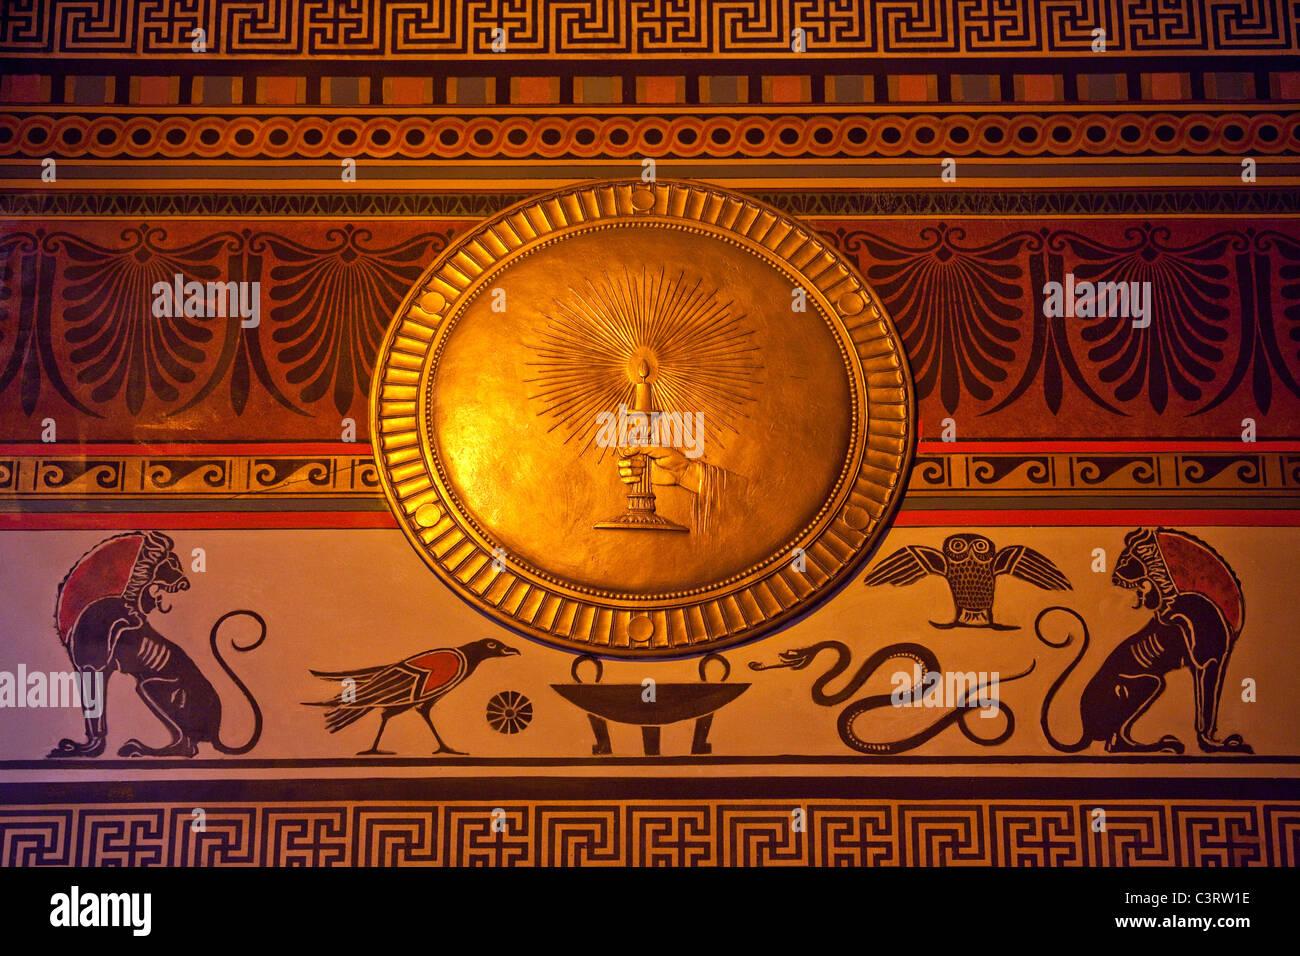 Scottish Rite of Freemasonry building in Washington DC - Stock Image